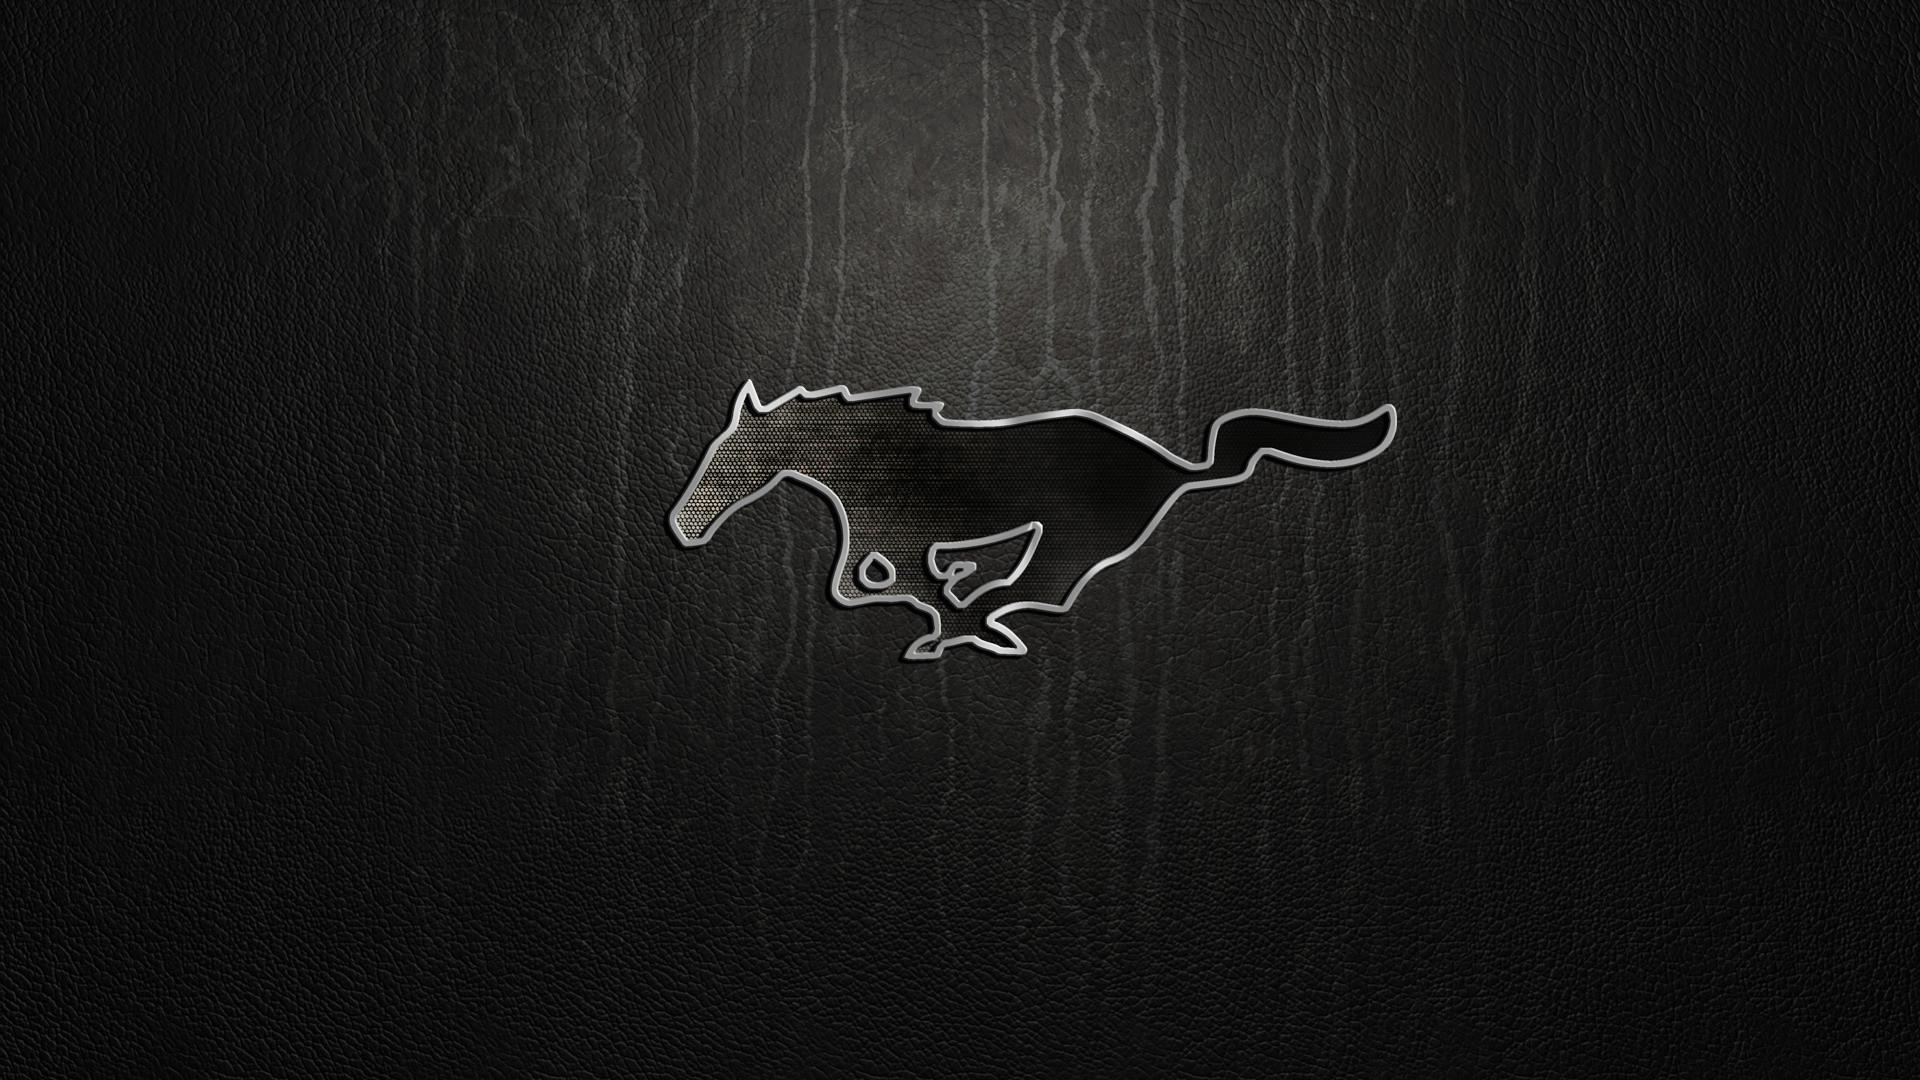 ford mustang logo wallpaper photos